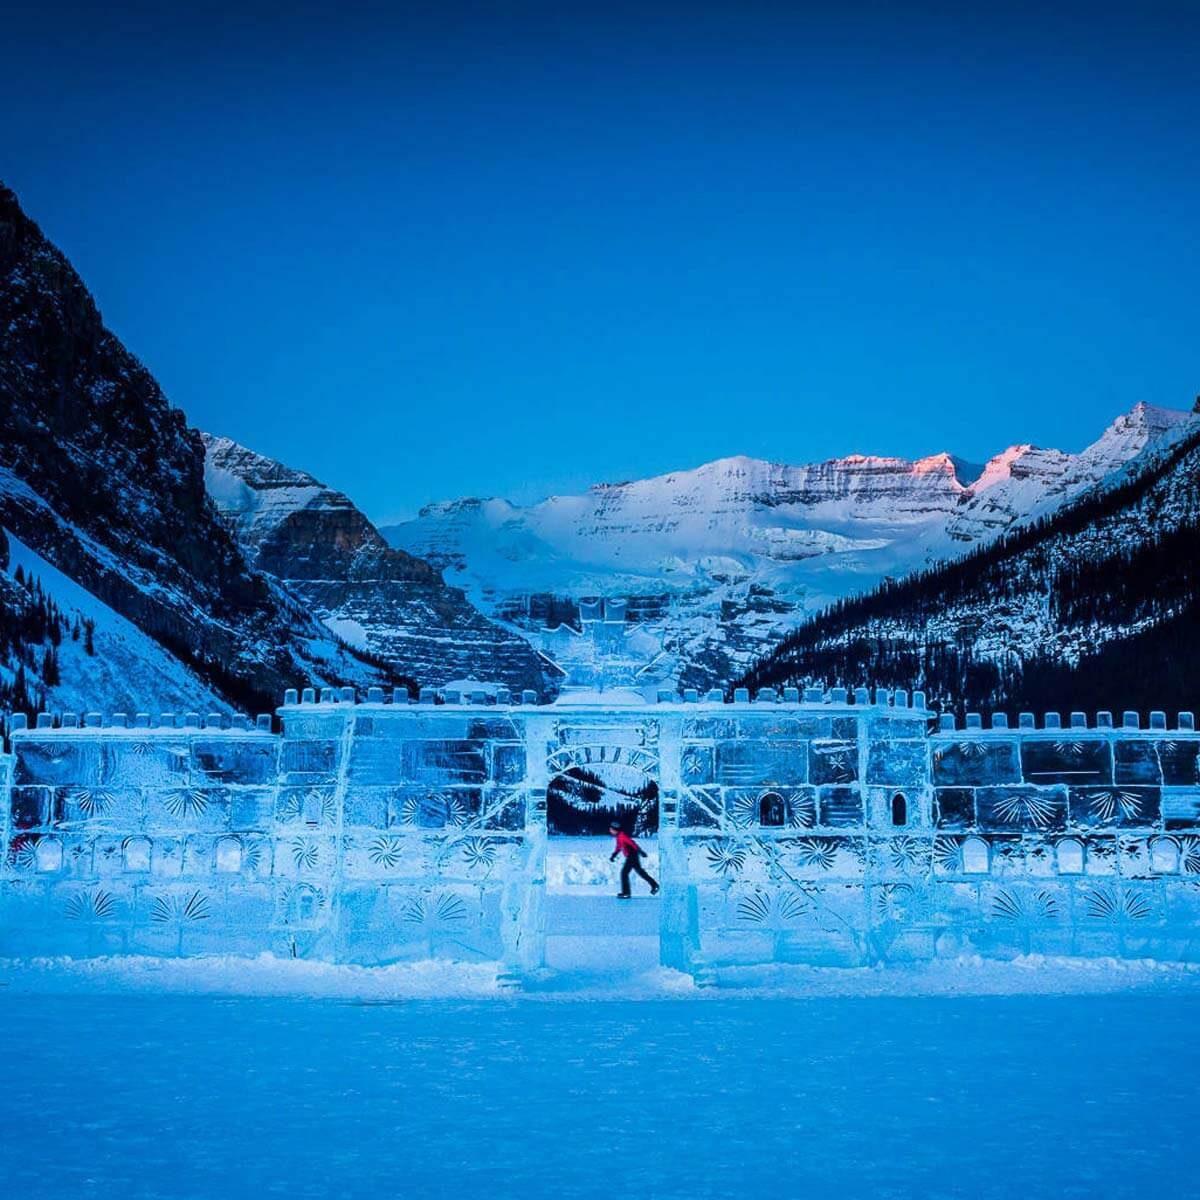 alpen-skate-c2a9-christopher-martin-5839-3 ice castle skating rink